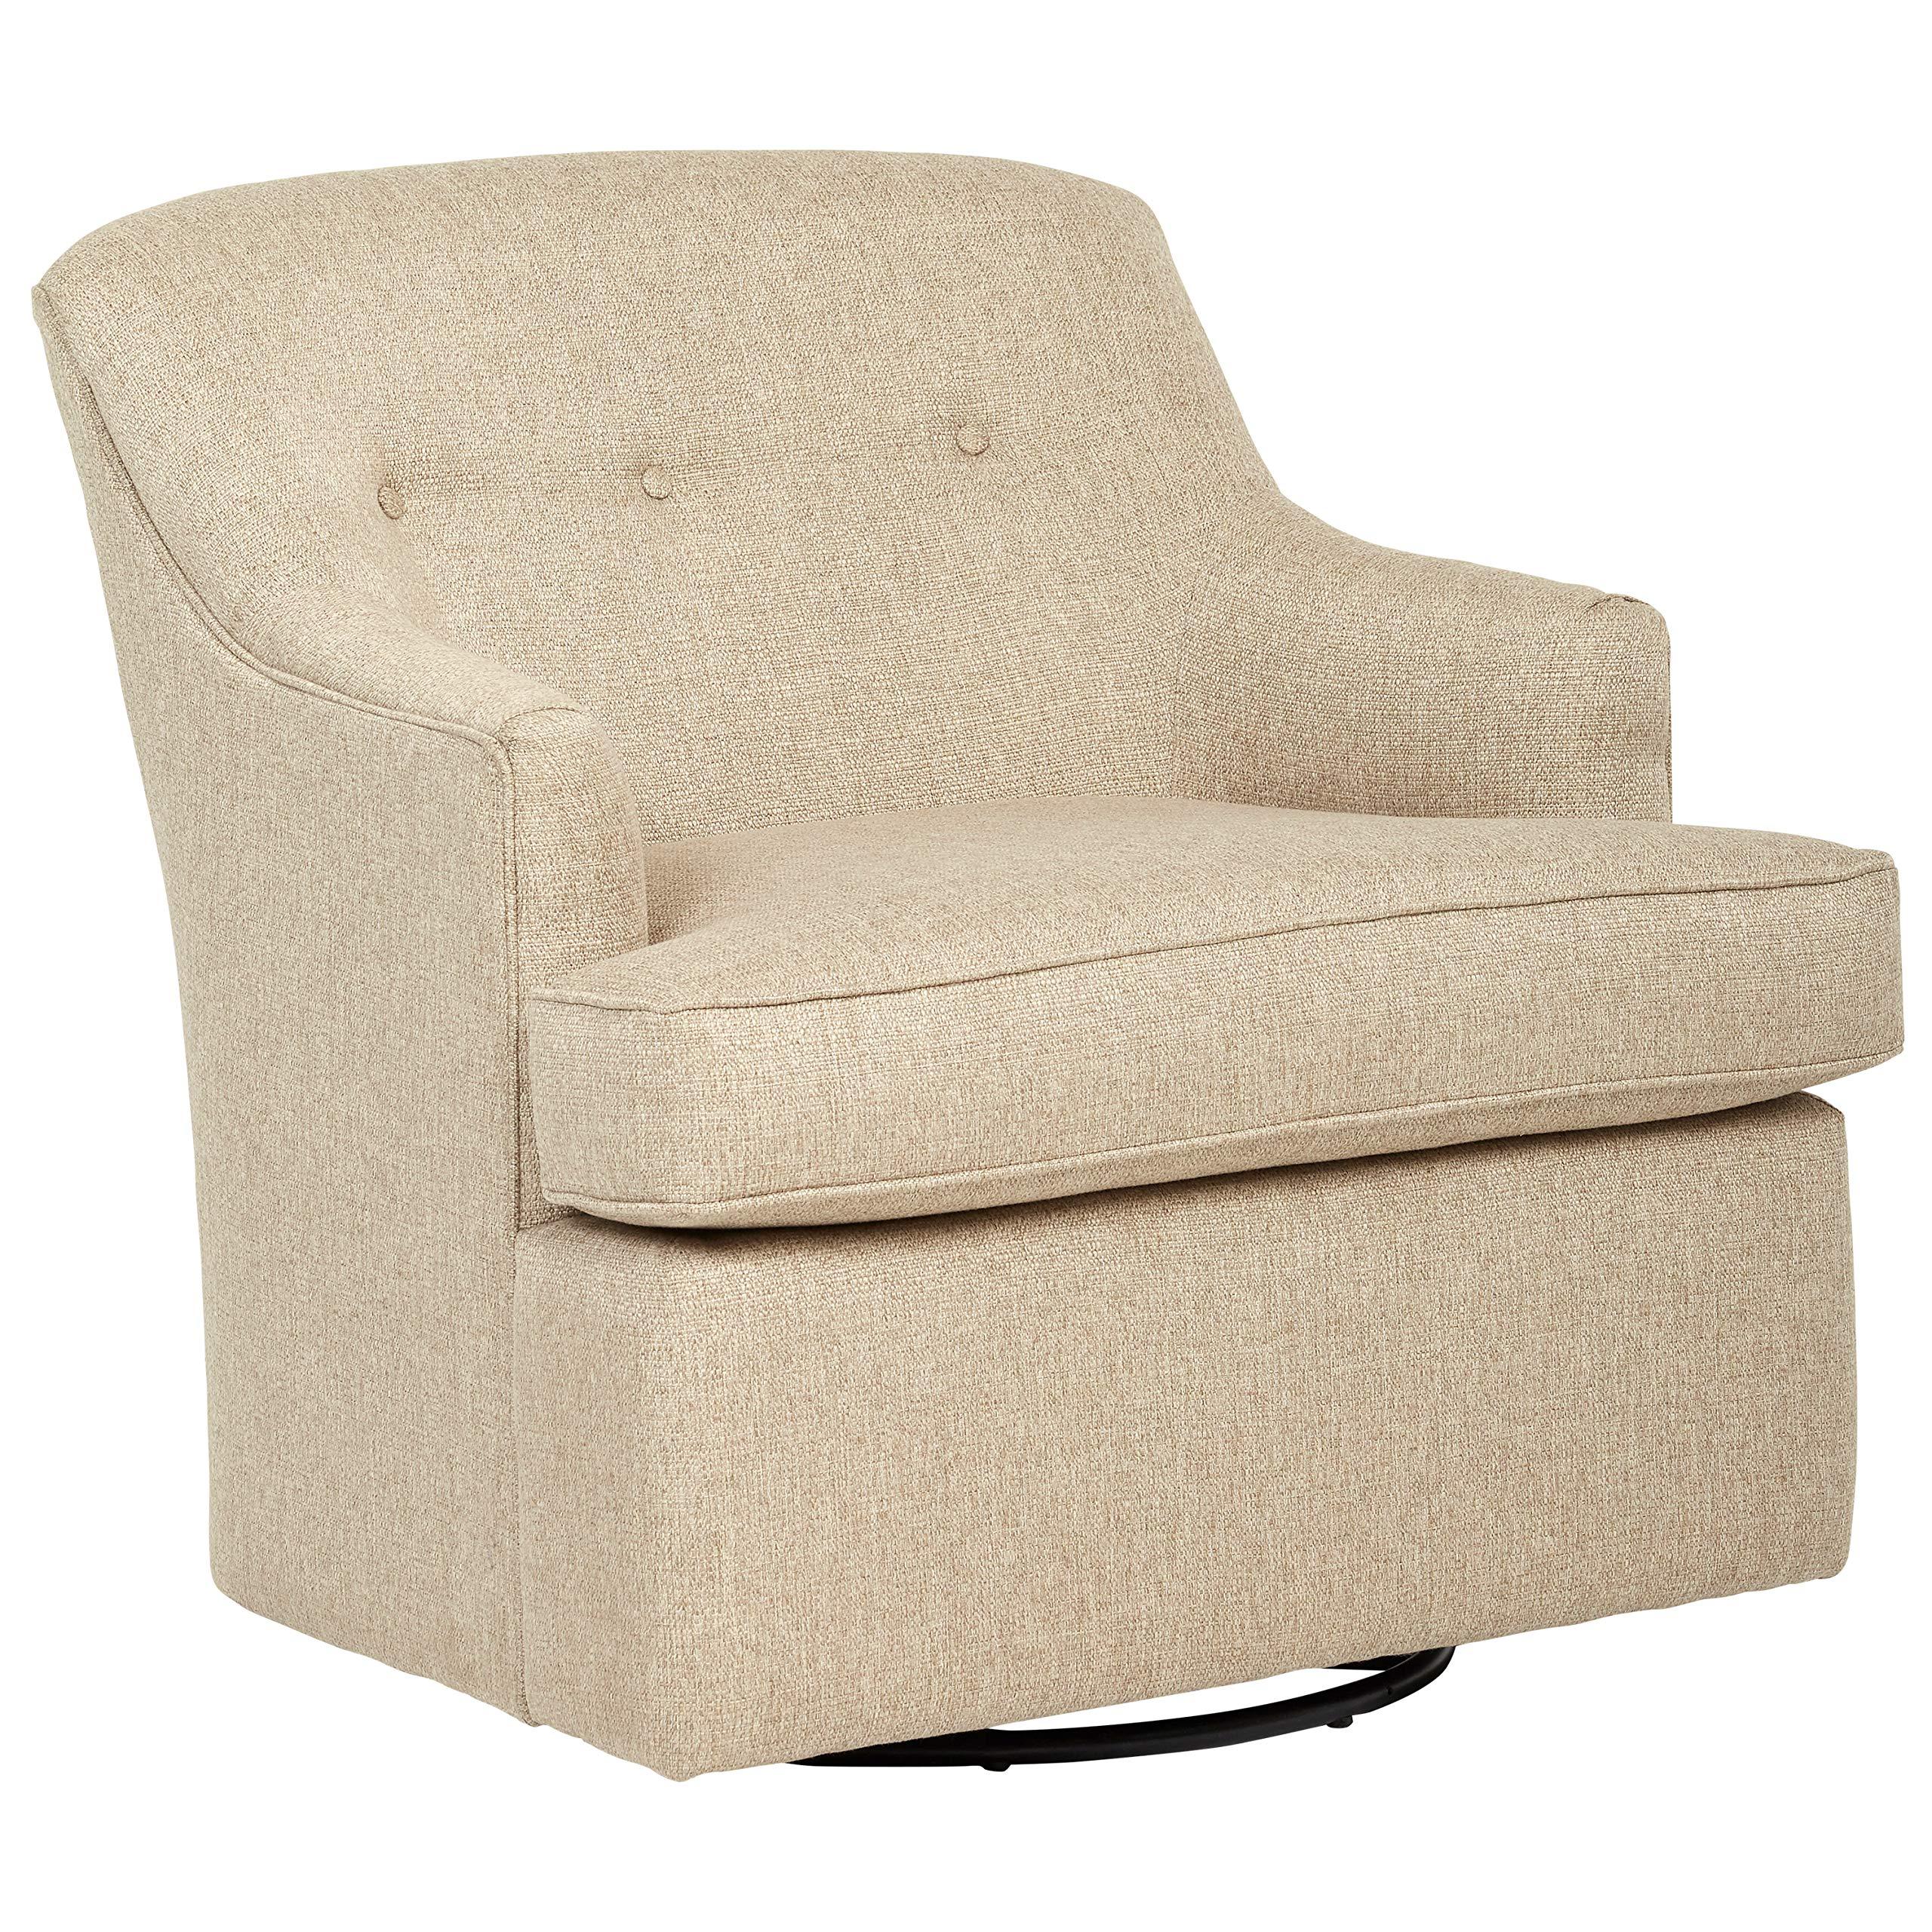 Stone & Beam Wolcott Swivel Chair, Fabric, 33''W, Latte